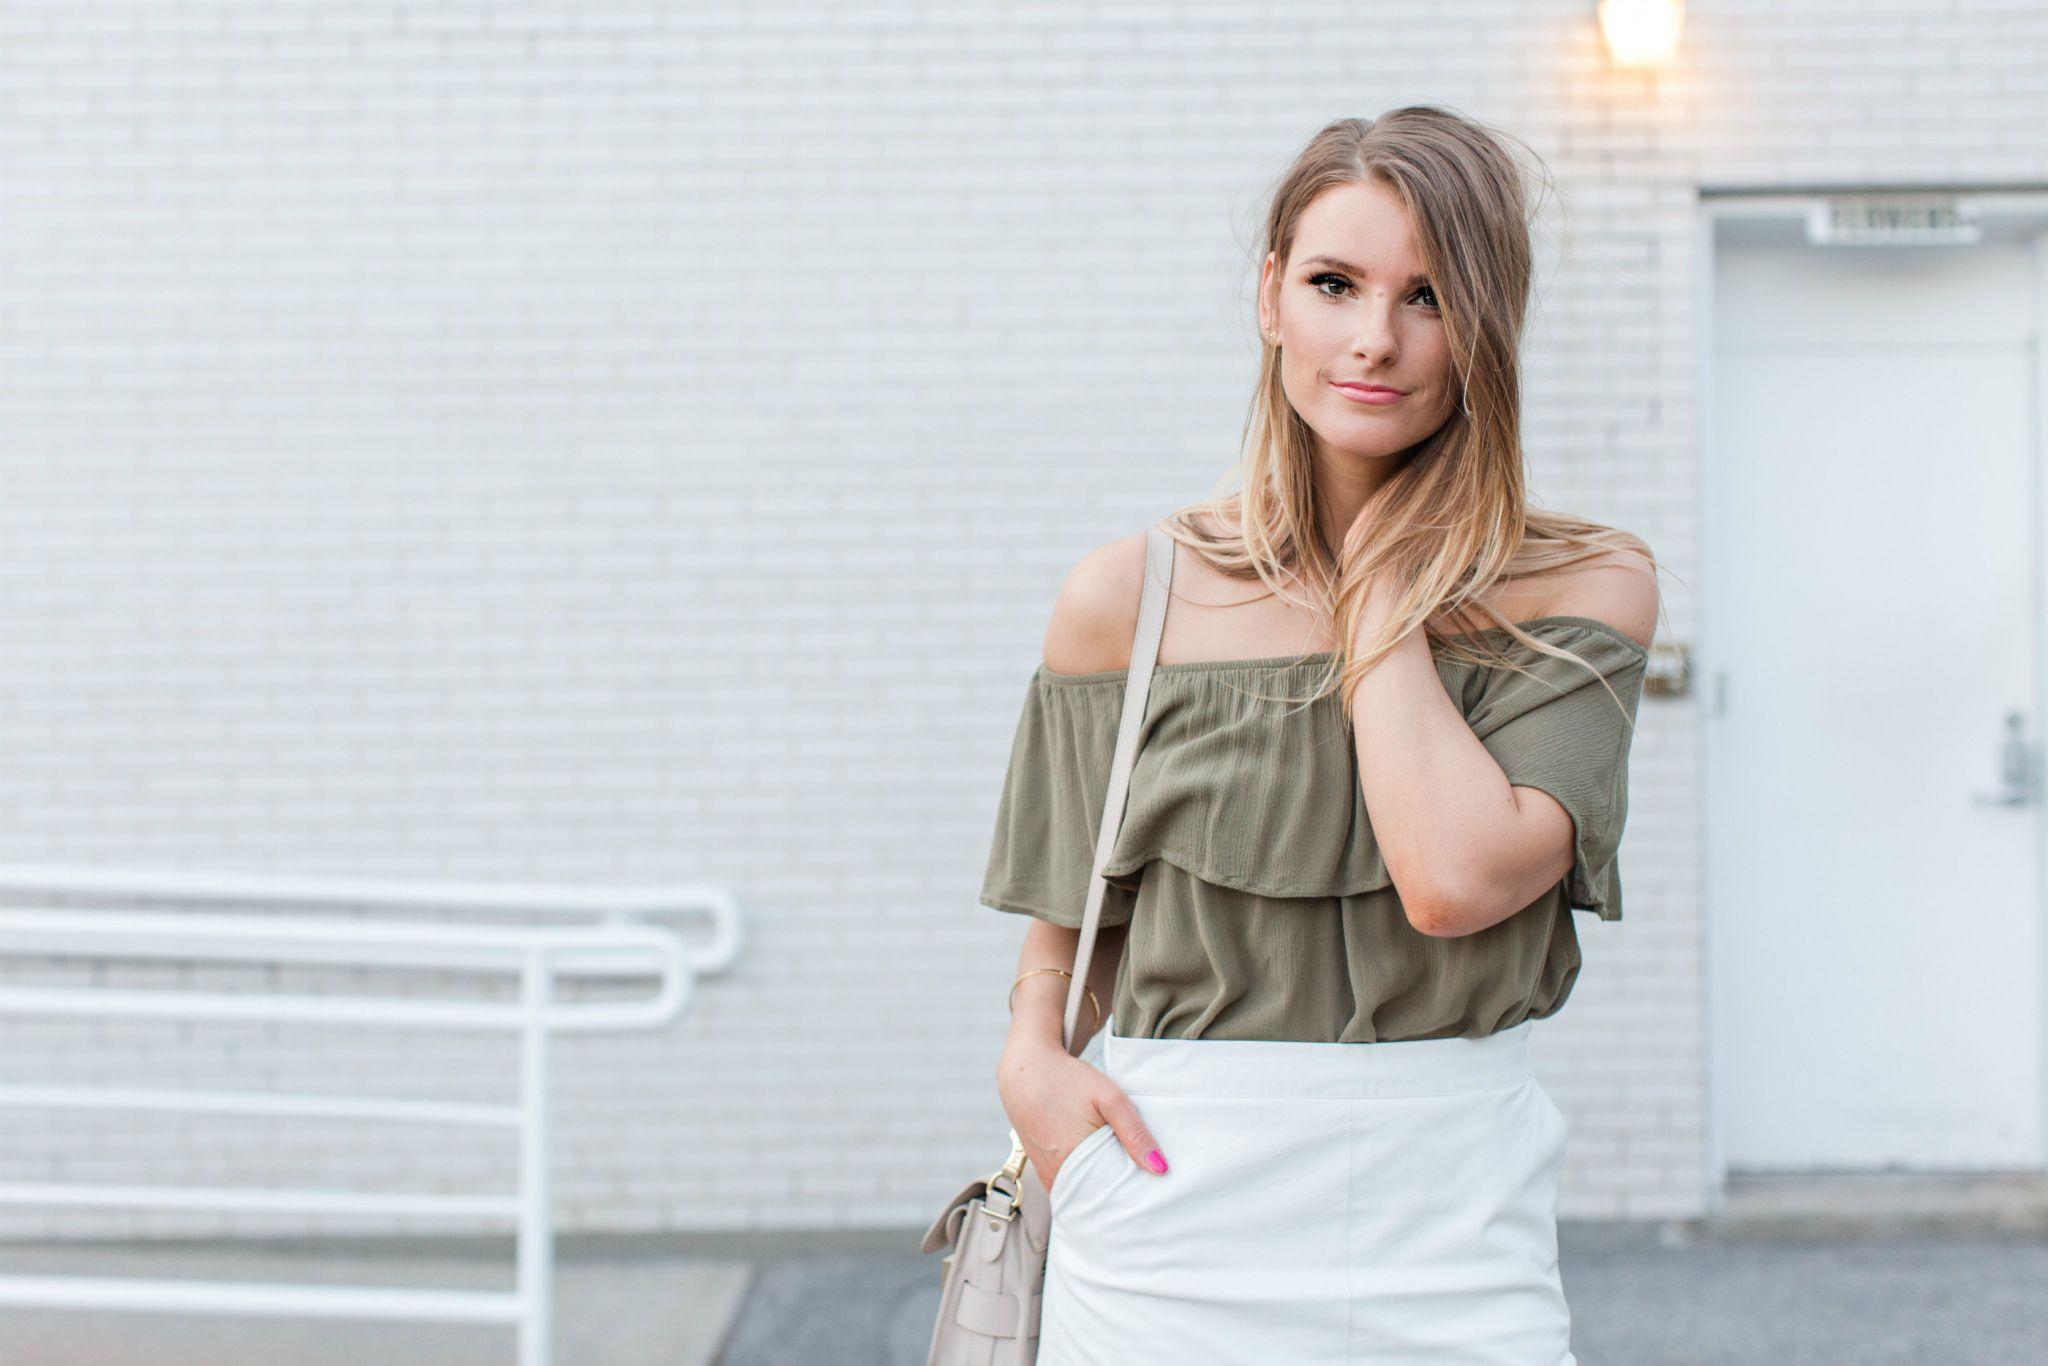 life-with-aco-amanda-l-conquer-ottawa-fashion-blogger.jpg